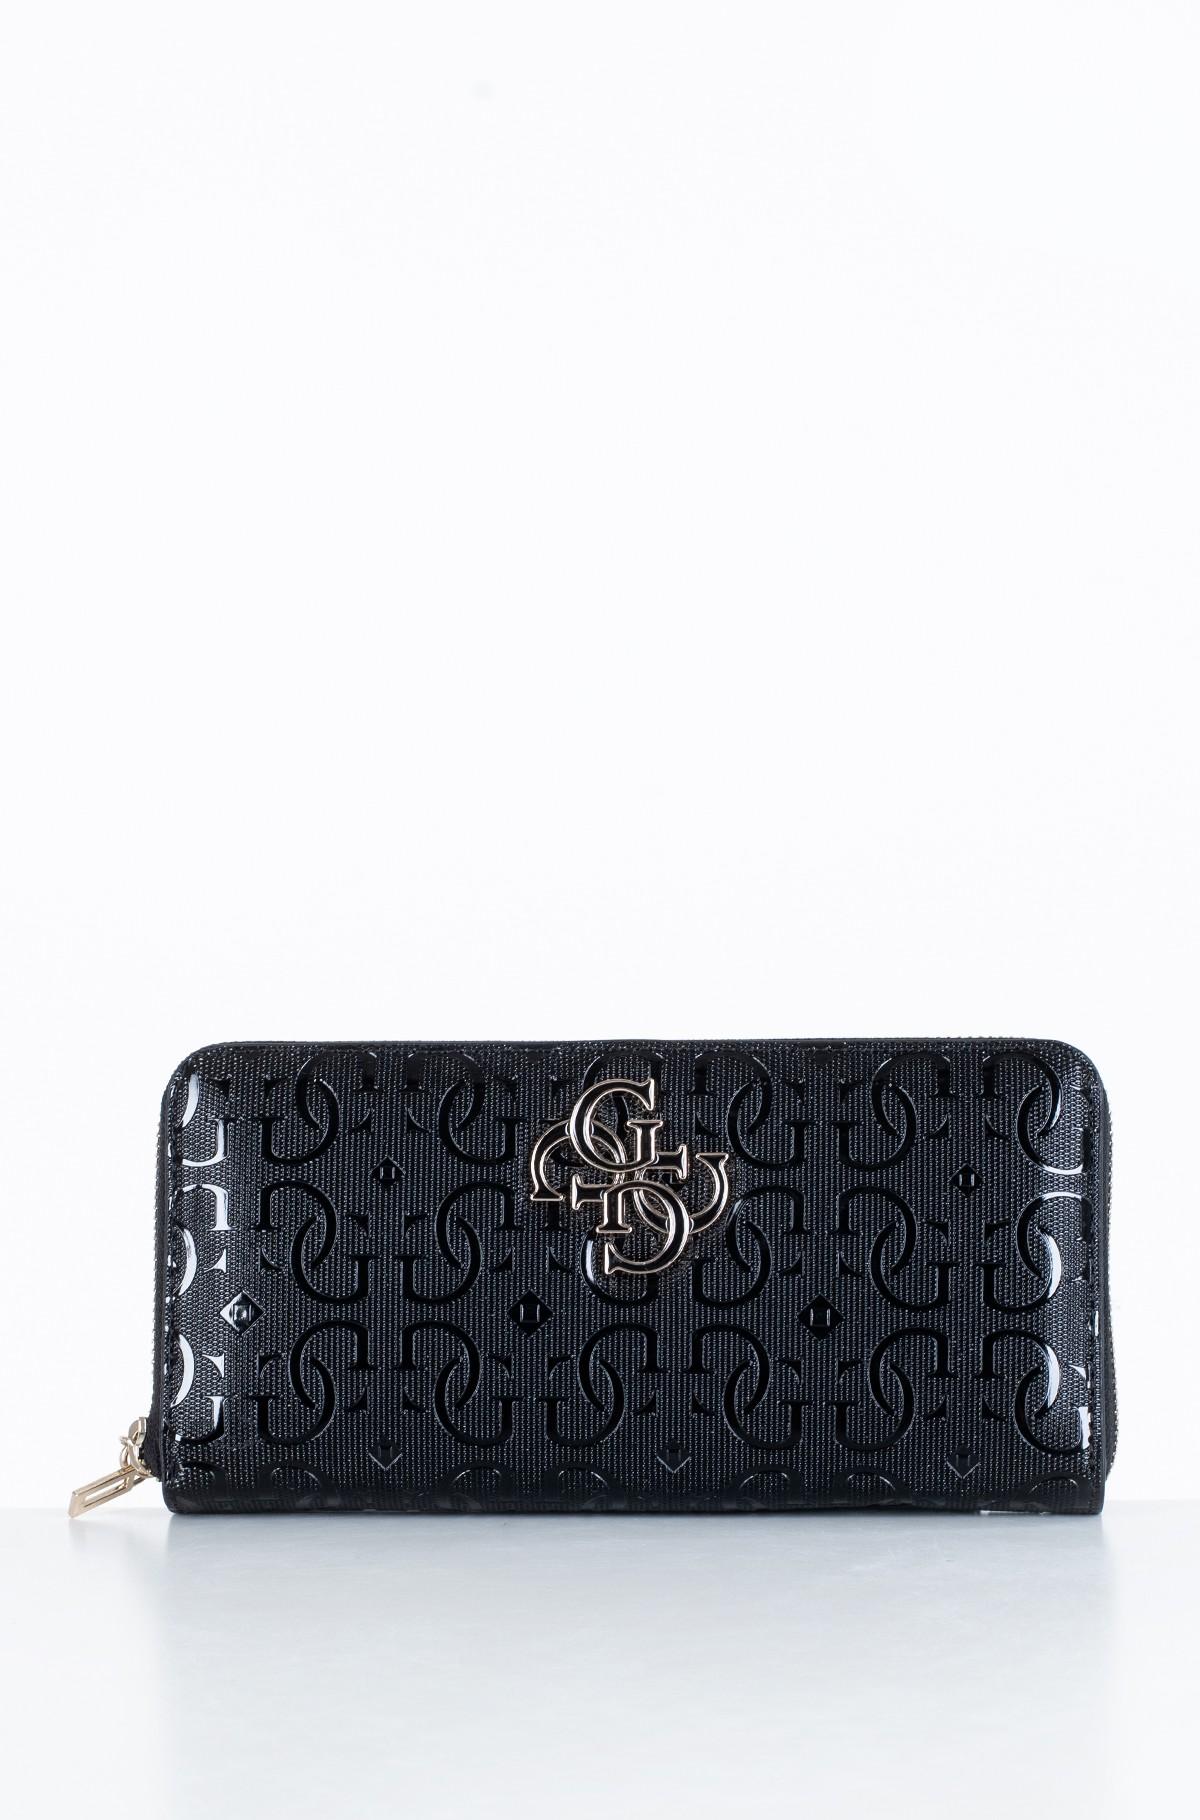 Wallet SWSG77 46460-full-1